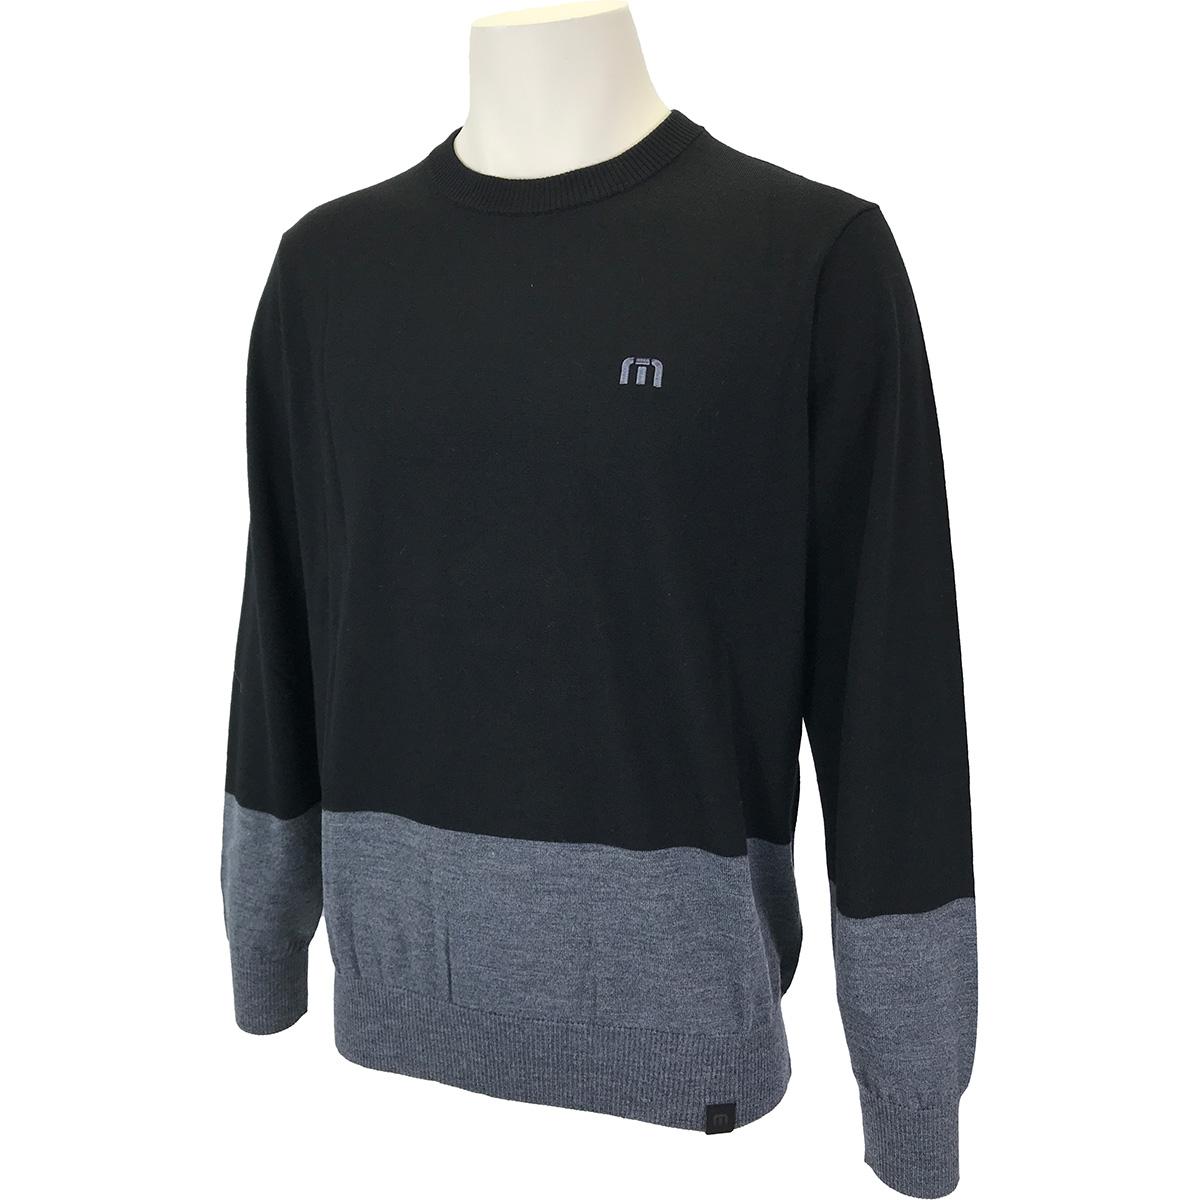 Bi カラーセーター